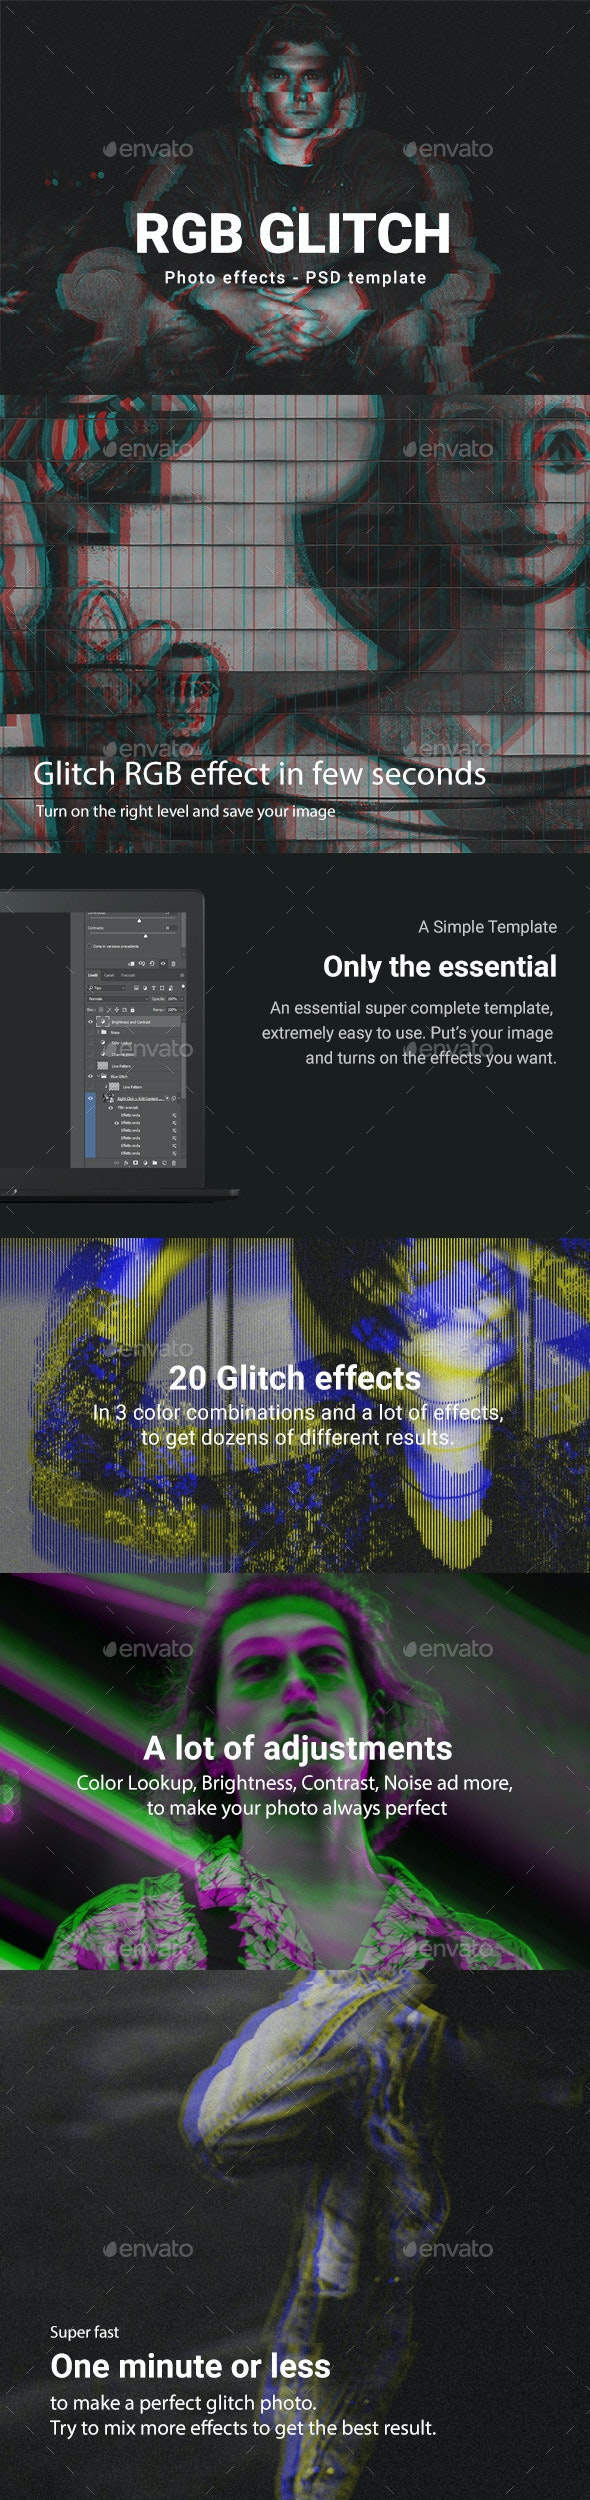 RGB Glitch Photoshop Template - Tech / Futuristic Photo Templates